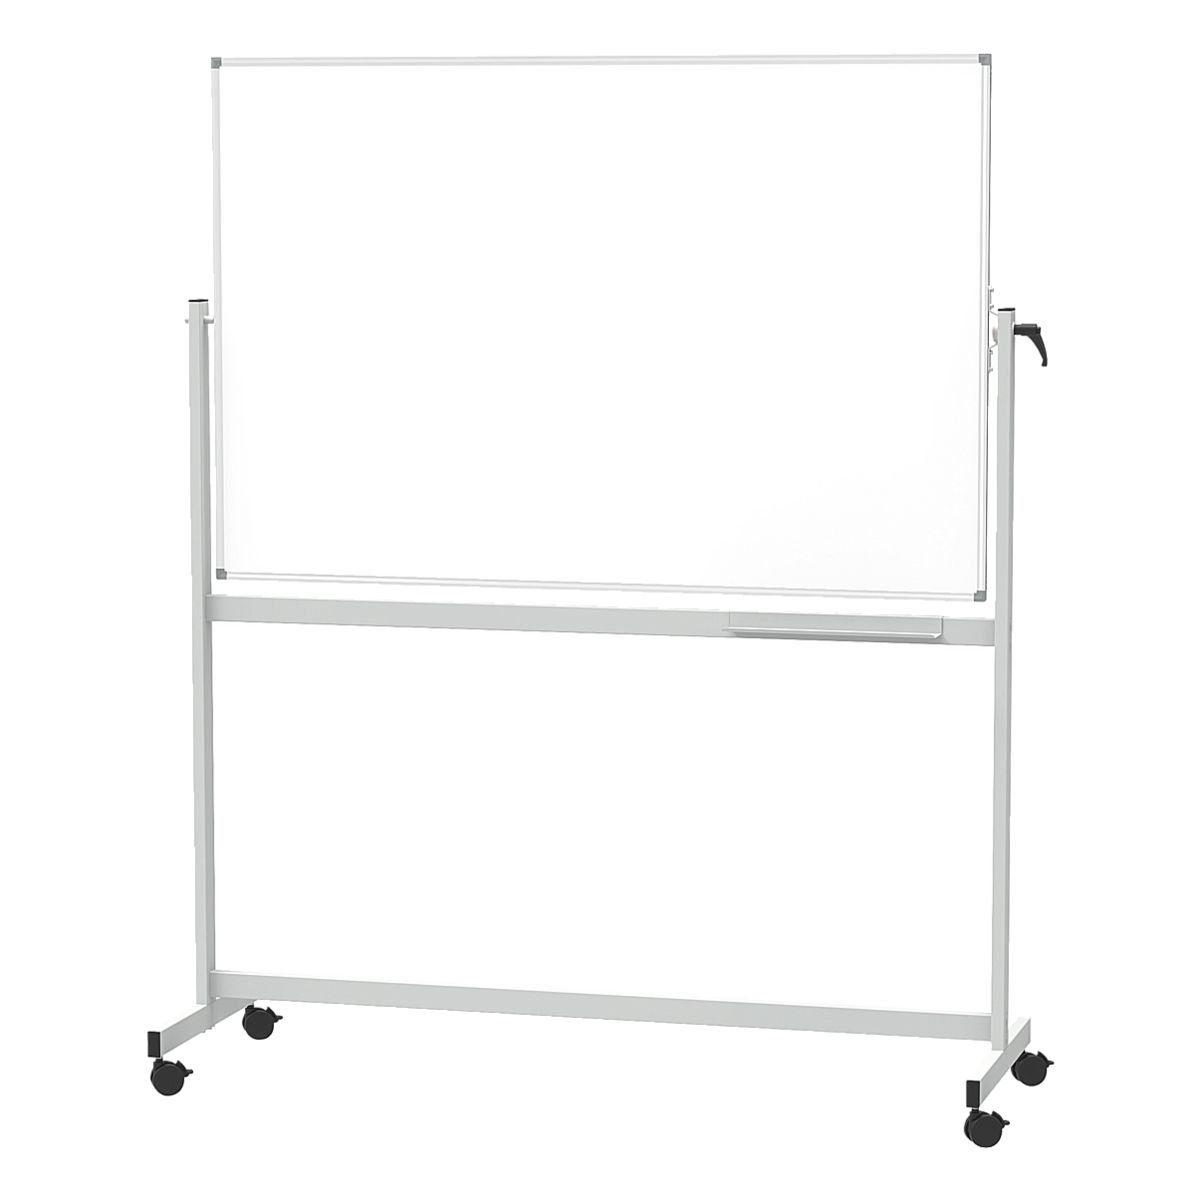 Maul Whiteboard kunststoffbeschichtet, 150 x 100 cm »Maul Standard 6459384«